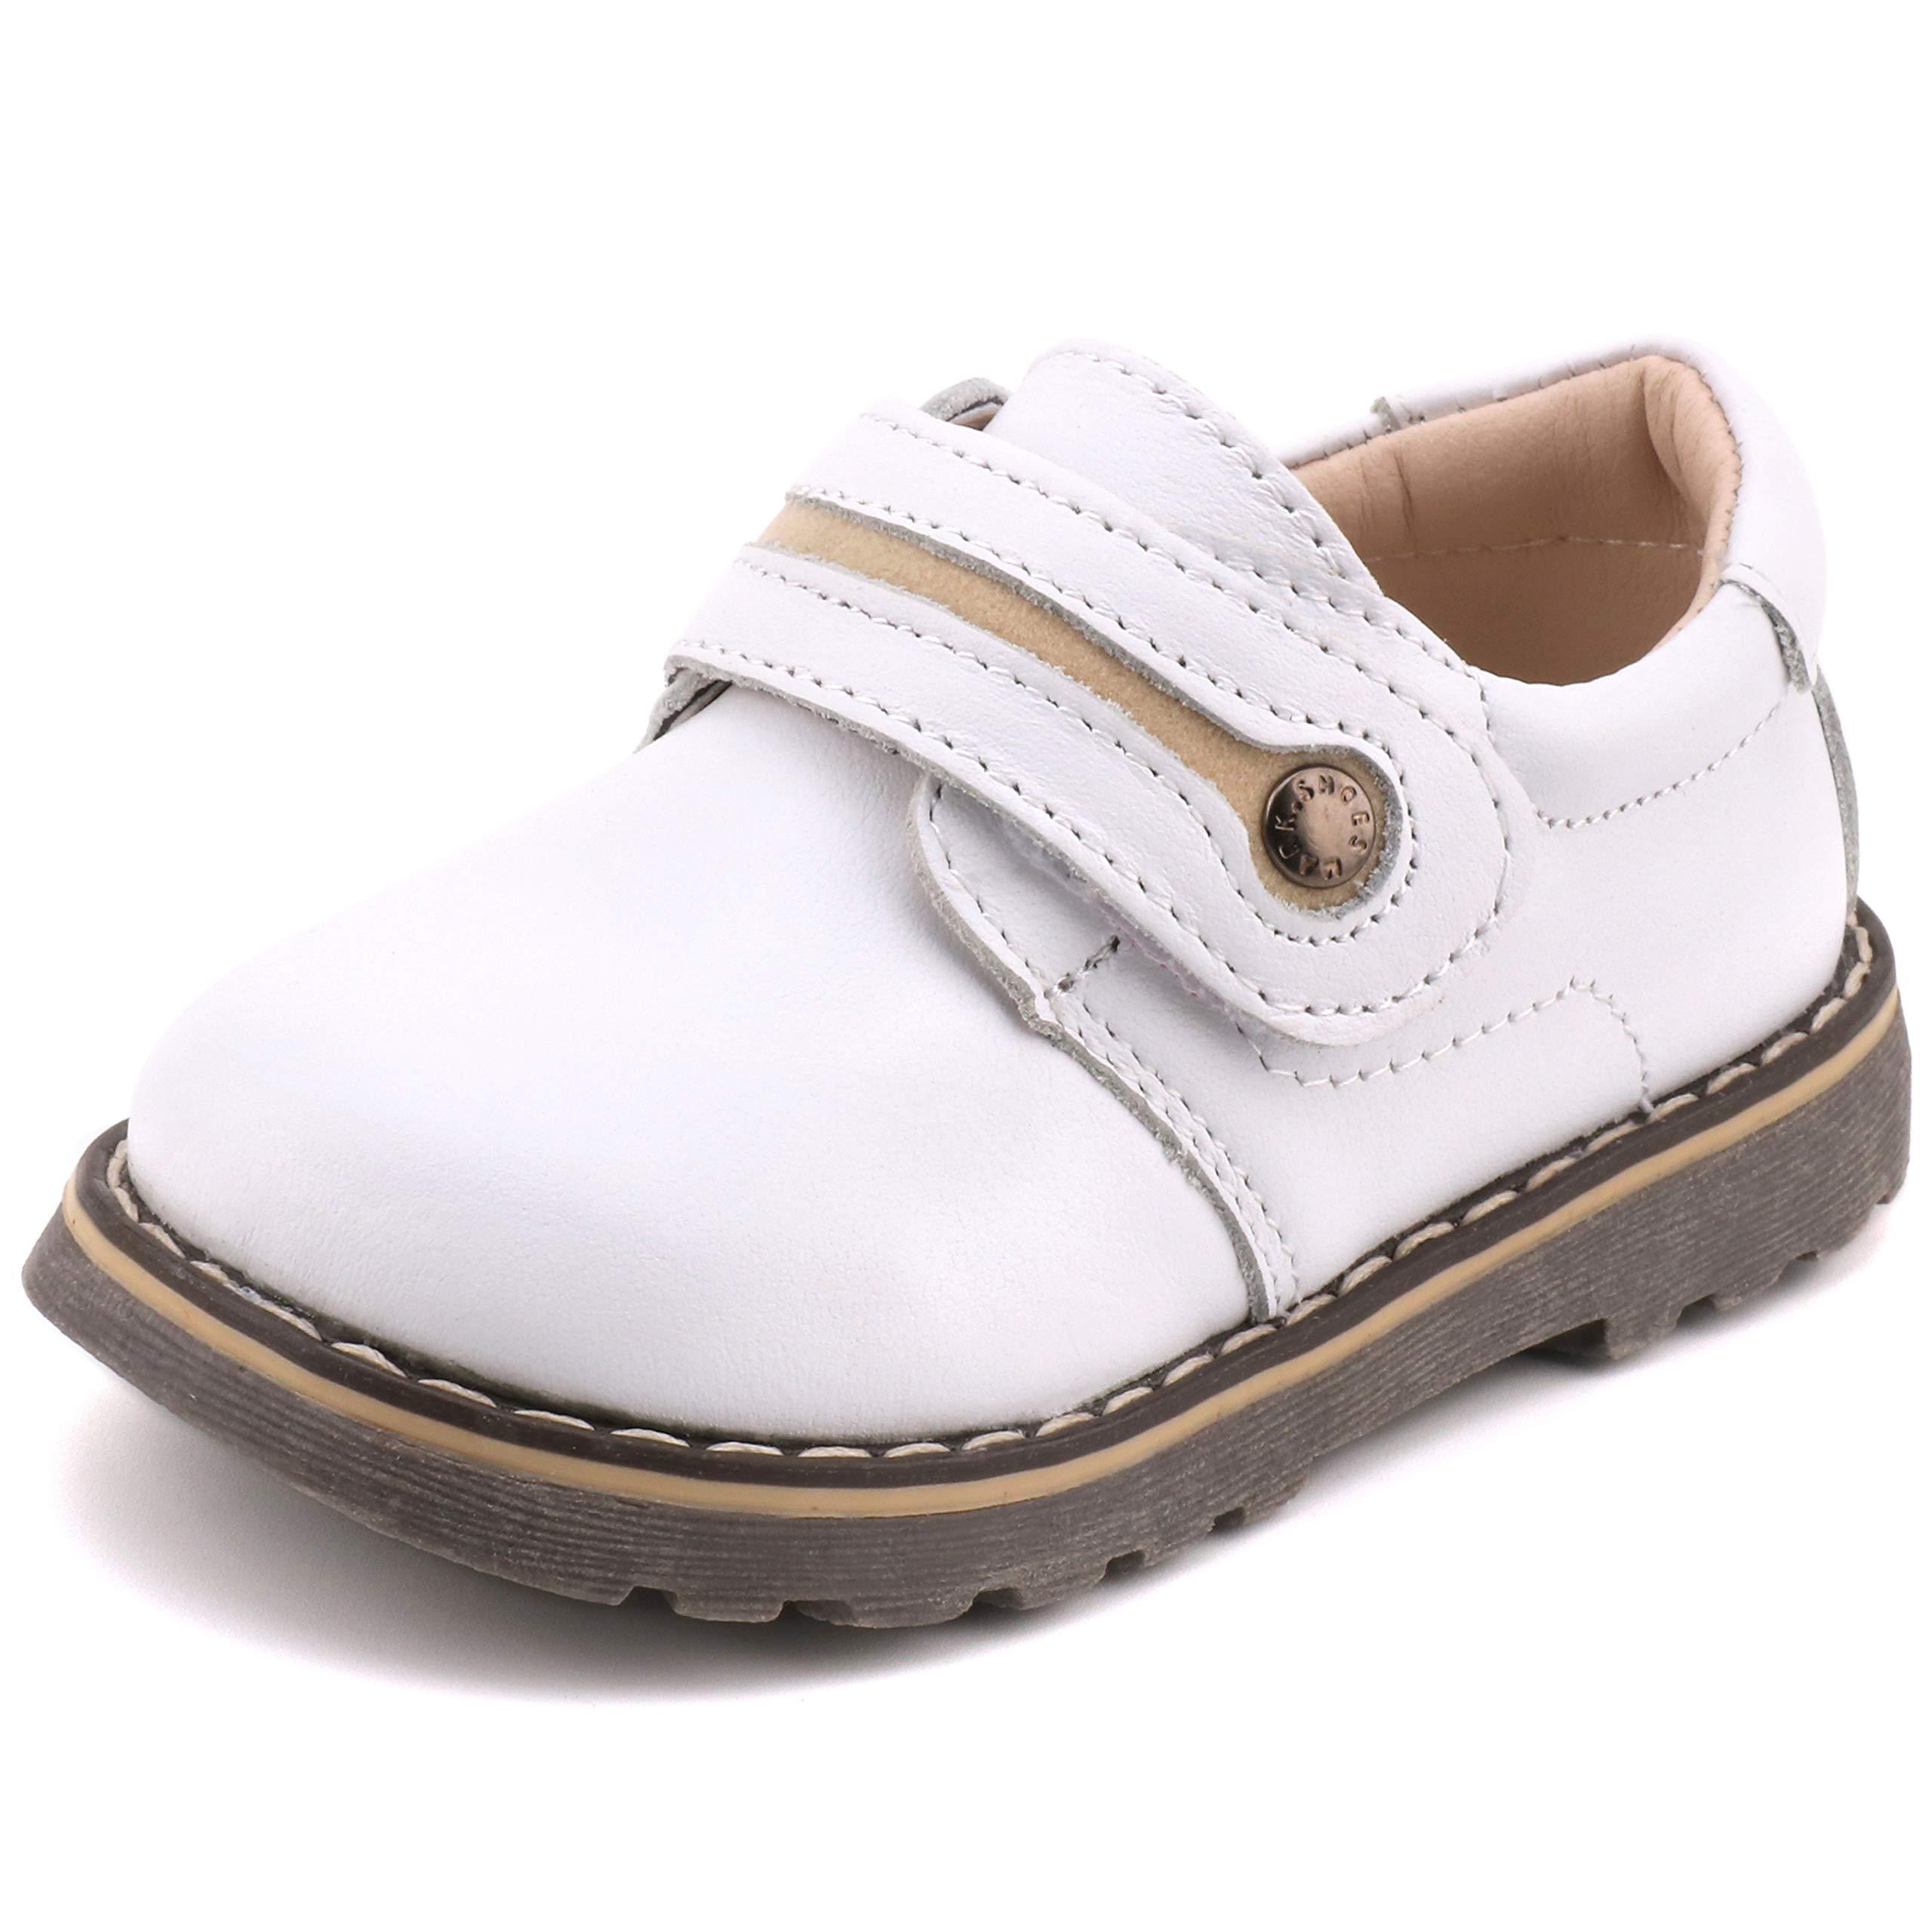 Femizee Toddler Boys Leather Loafers Comfort Uniform Oxford Dress Wedding Shoes, White, 1327 CN24